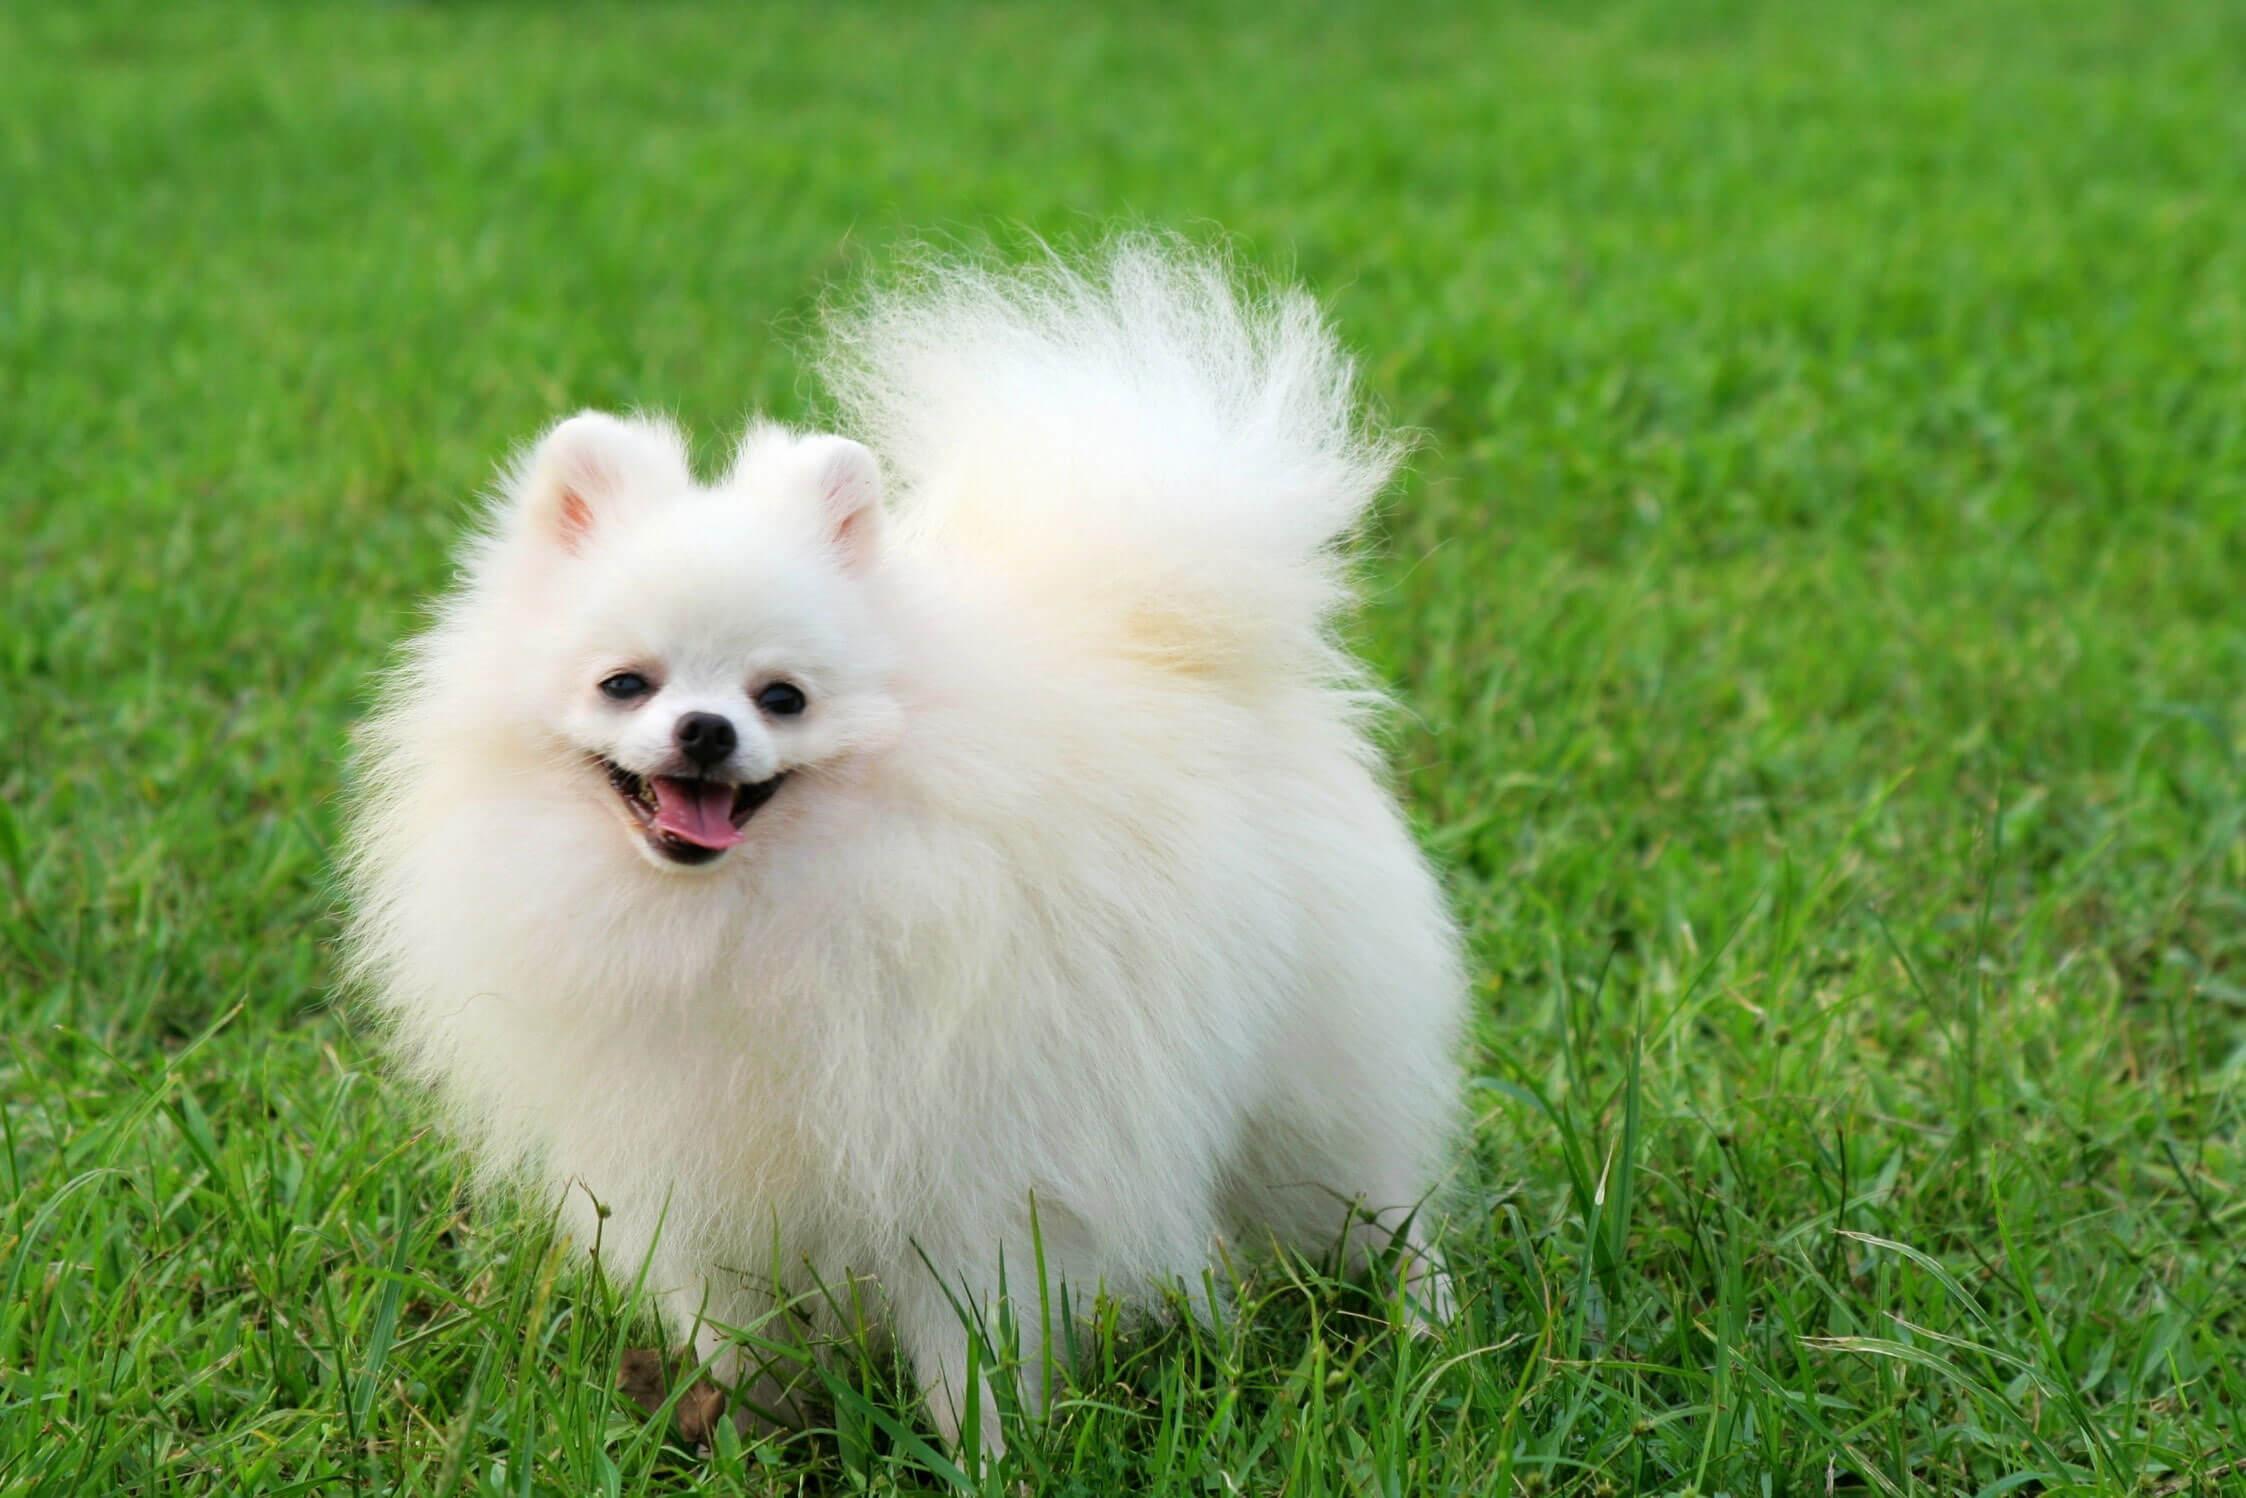 Source:http://www.dog-learn.com/dog-breeds/pomeranian/